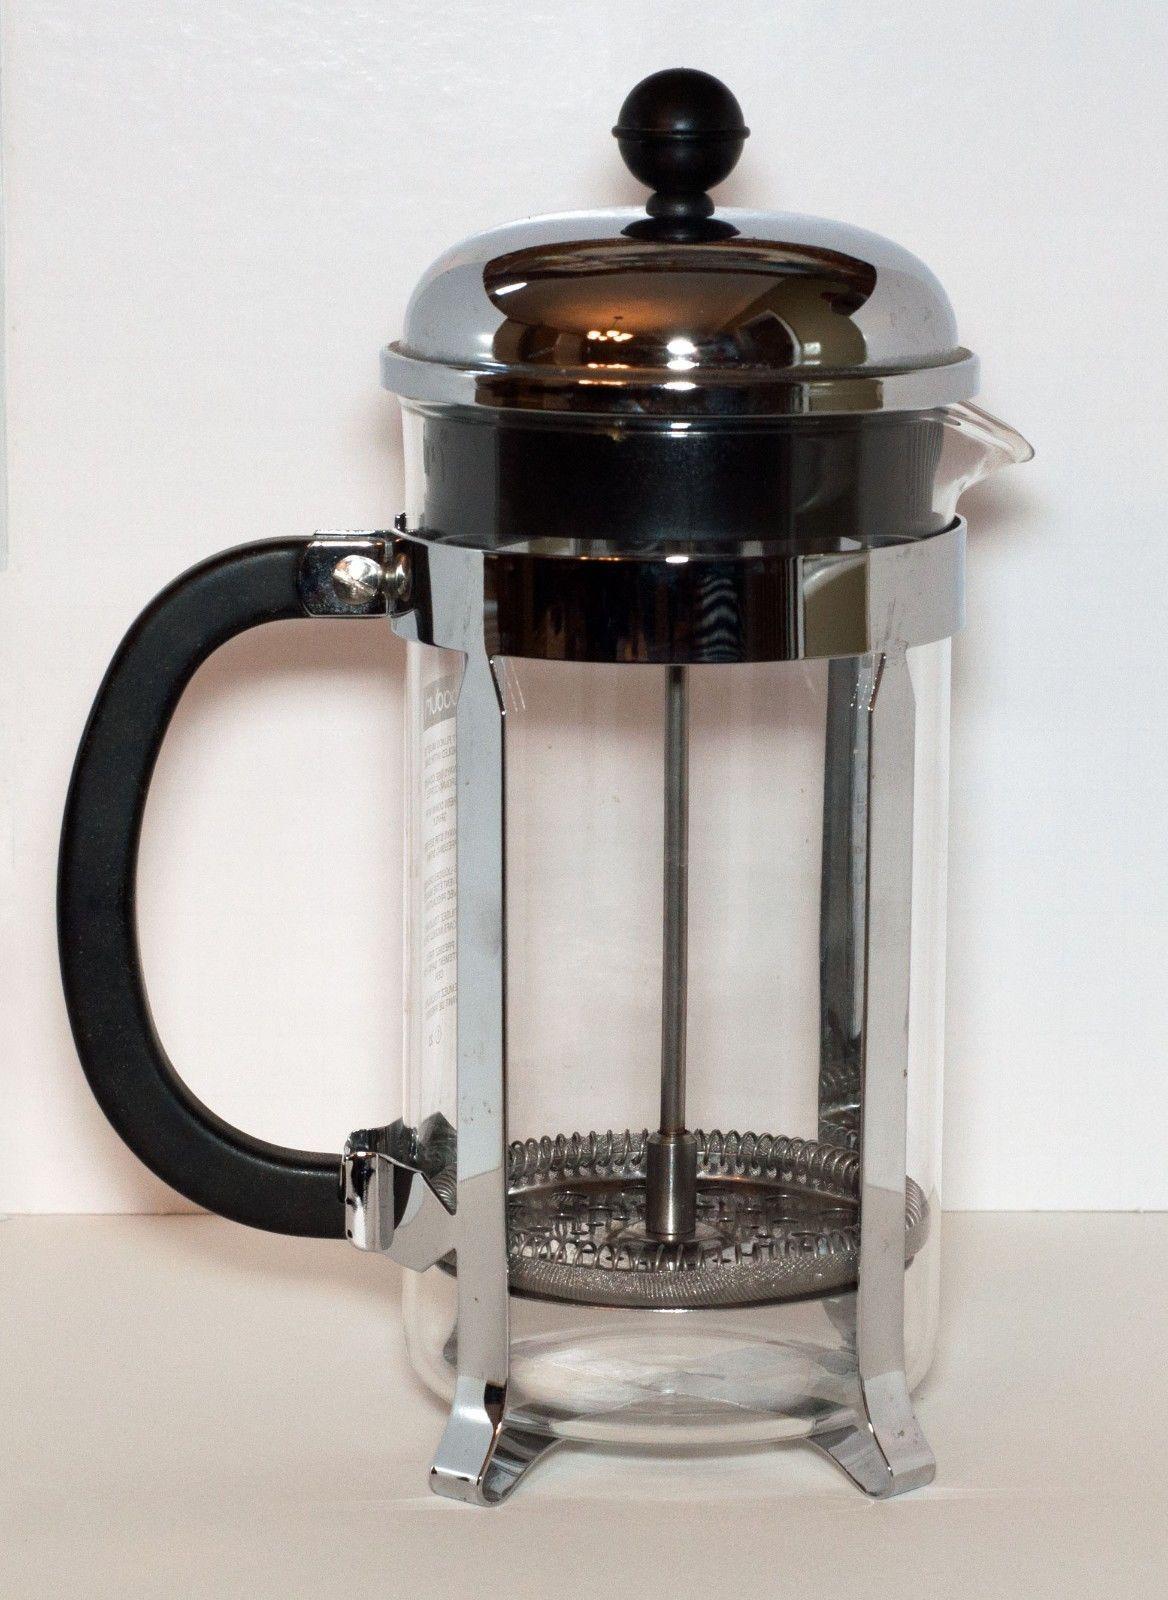 Bodum Coffee Maker Replacement Glass : Bodum Chambord French Press 4 Cup Coffee Maker - Glass - French Presses